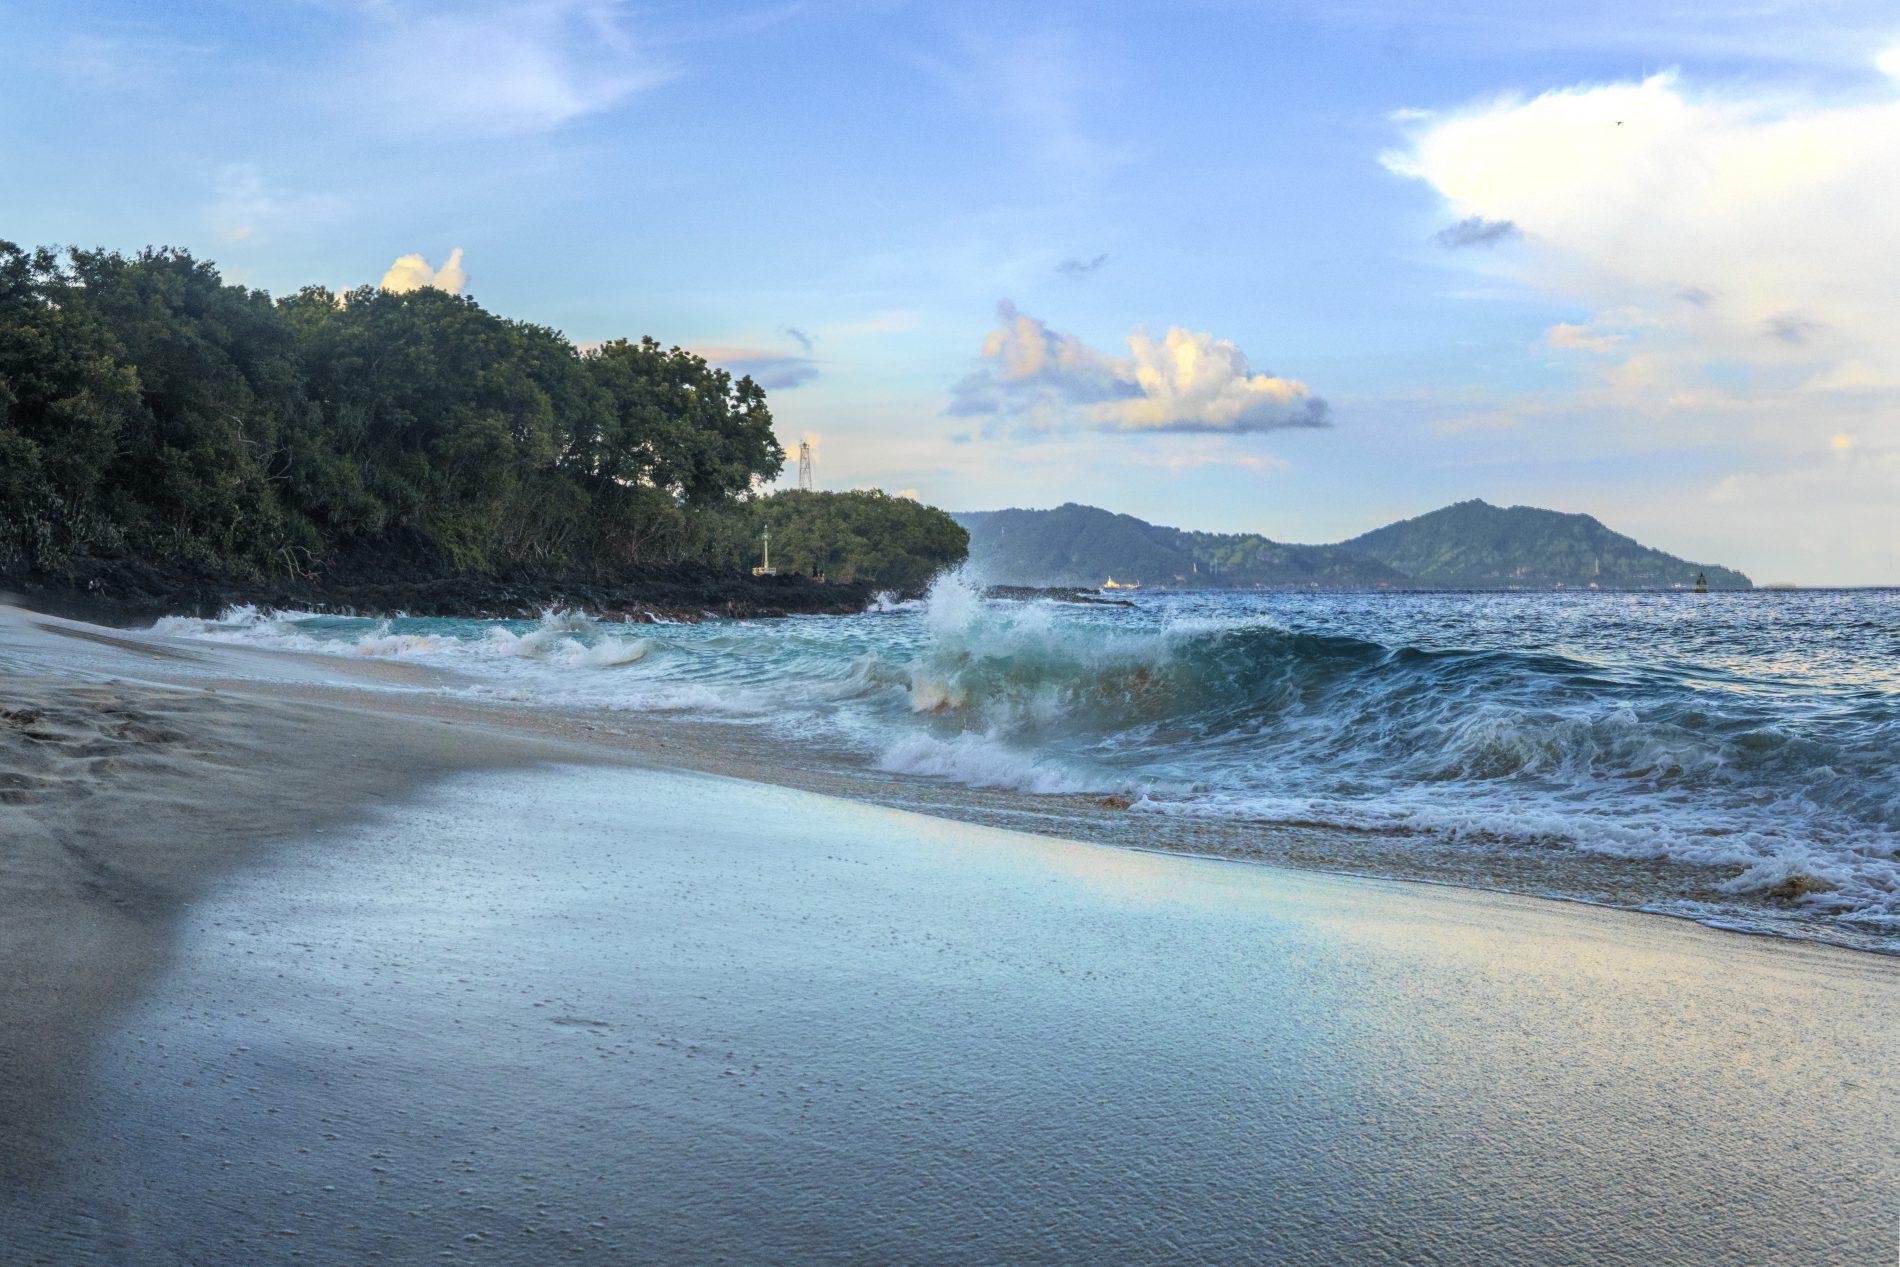 Ocean waves near trees